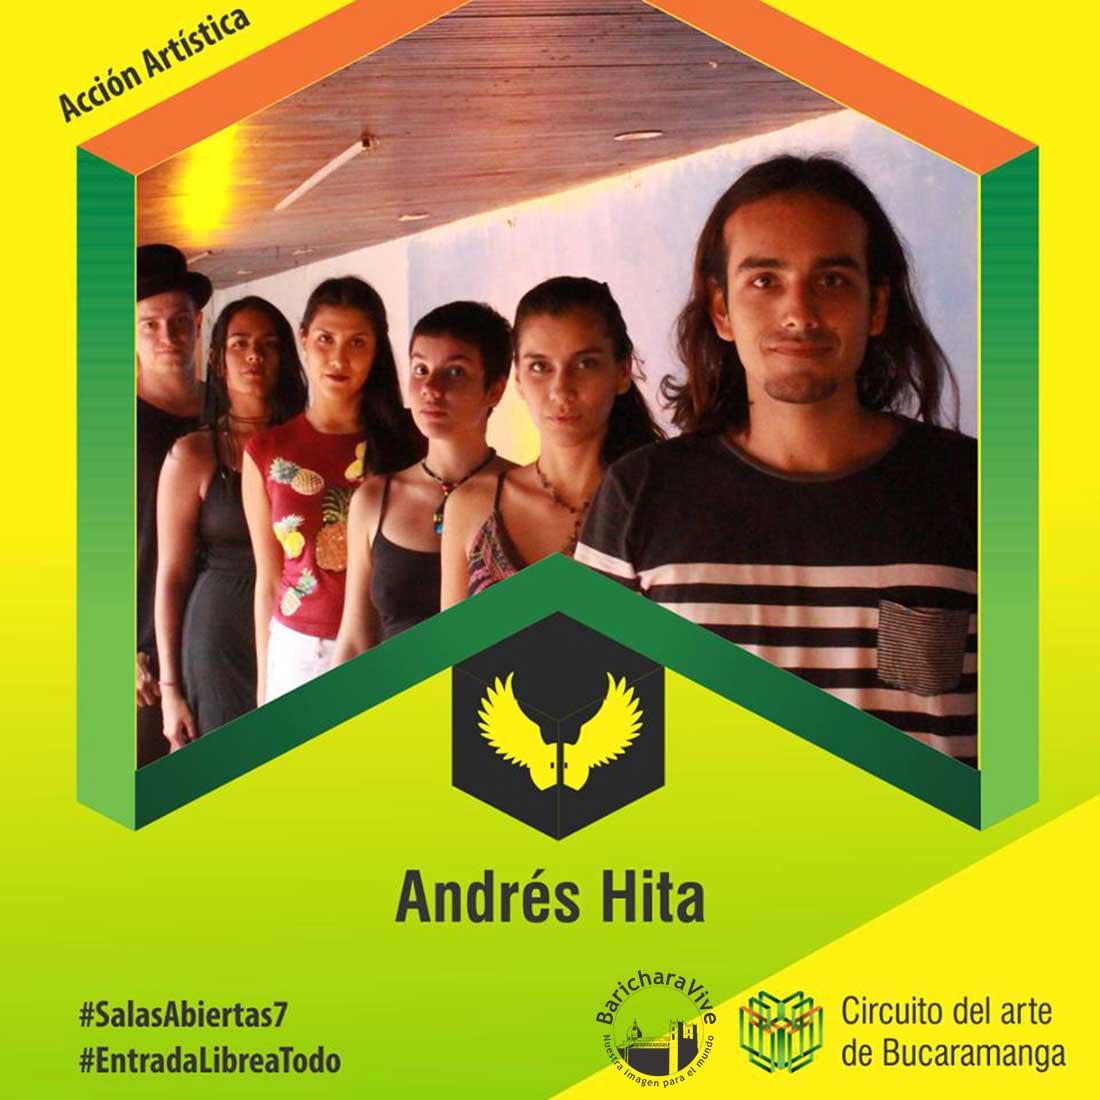 artista-andres-hita-7a-edicion-el-centro-con-las-salas-abiertas-bucaramanga-2017